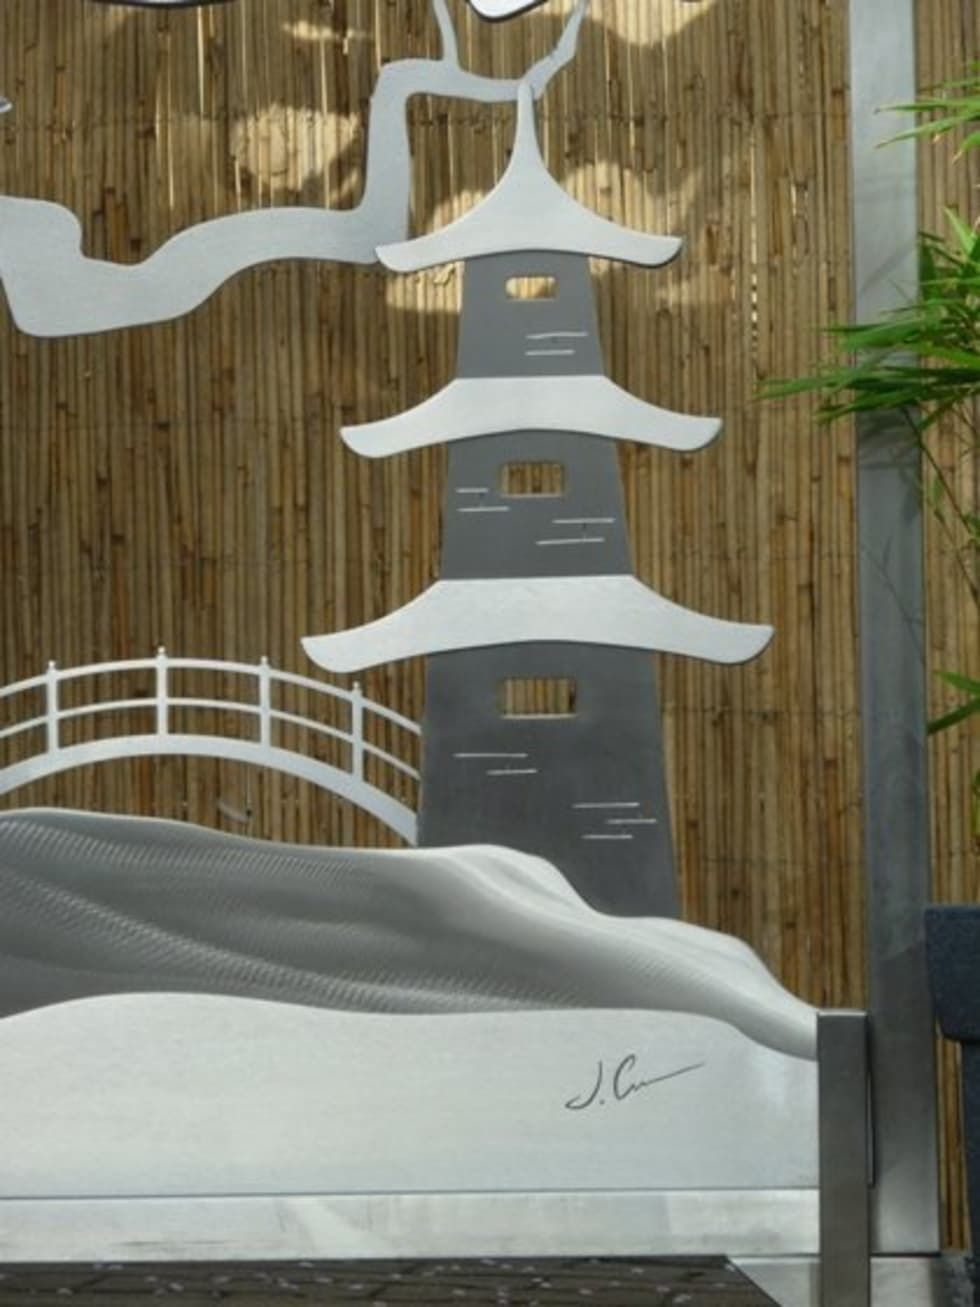 Edelstahl Tordesign: asiatischer Garten von Edelstahl Atelier Crouse - Stainless Steel Atelier